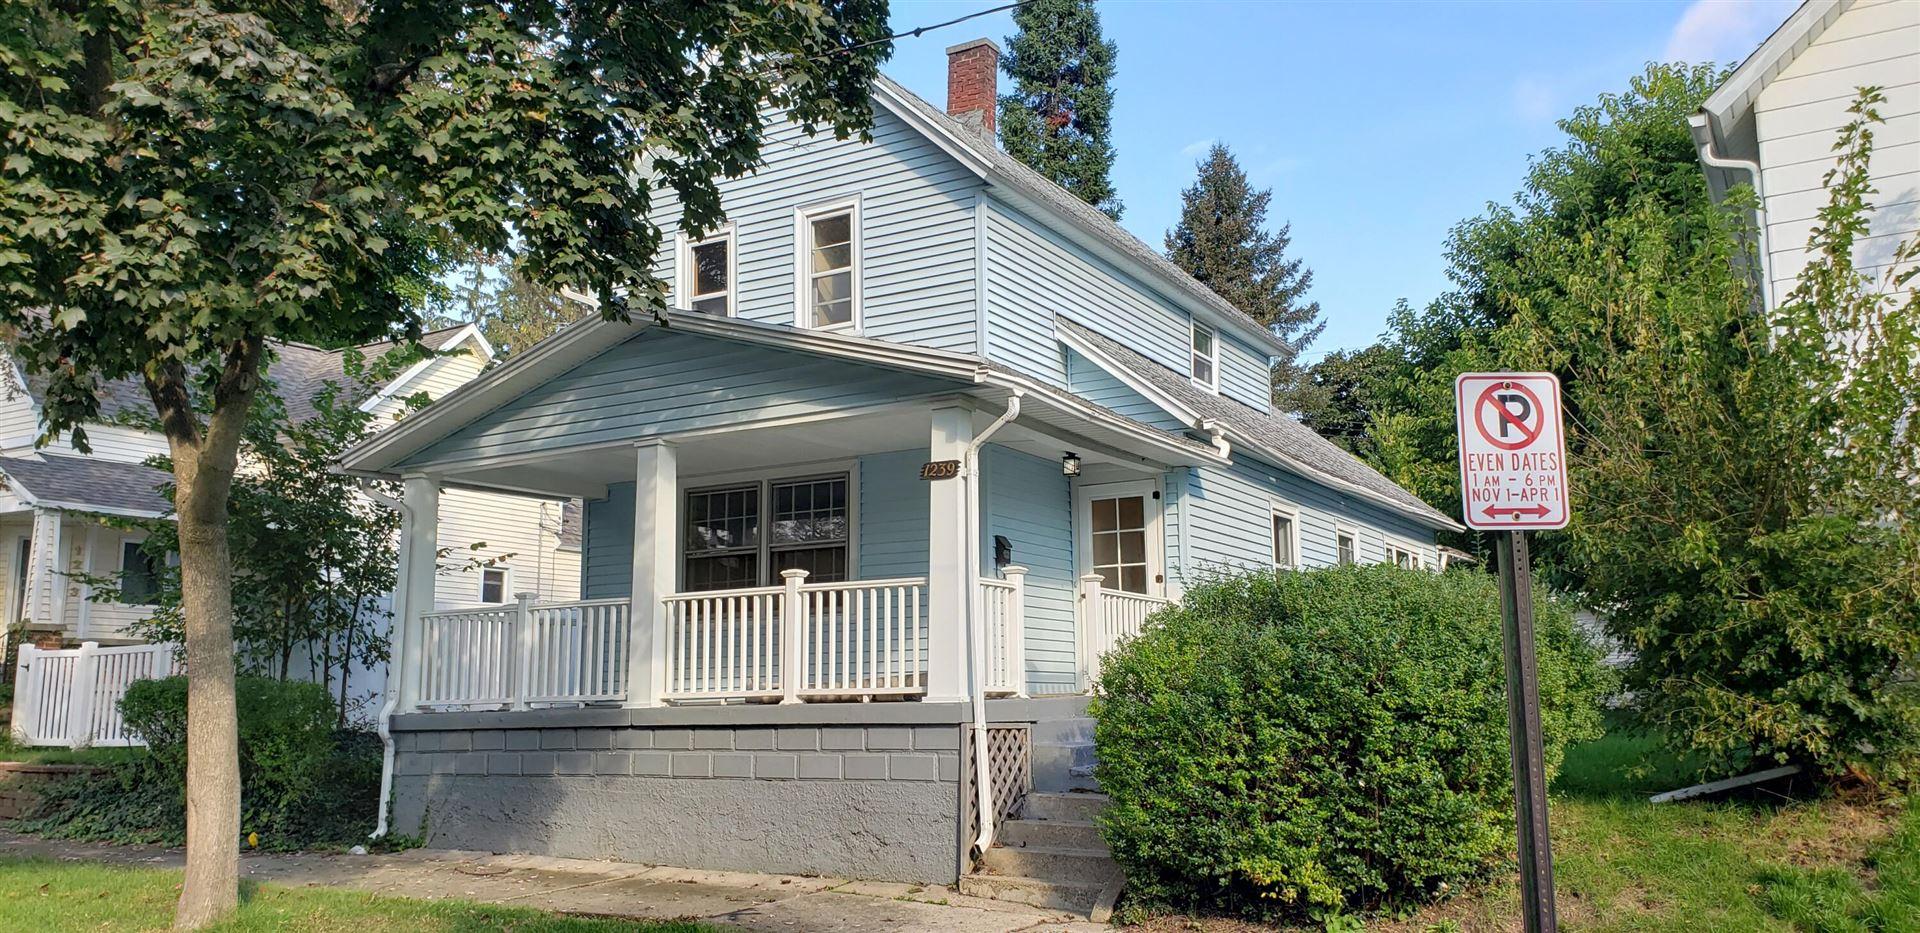 1239 Rennslaer Street NW, Grand Rapids, MI 49504 - MLS#: 21110283